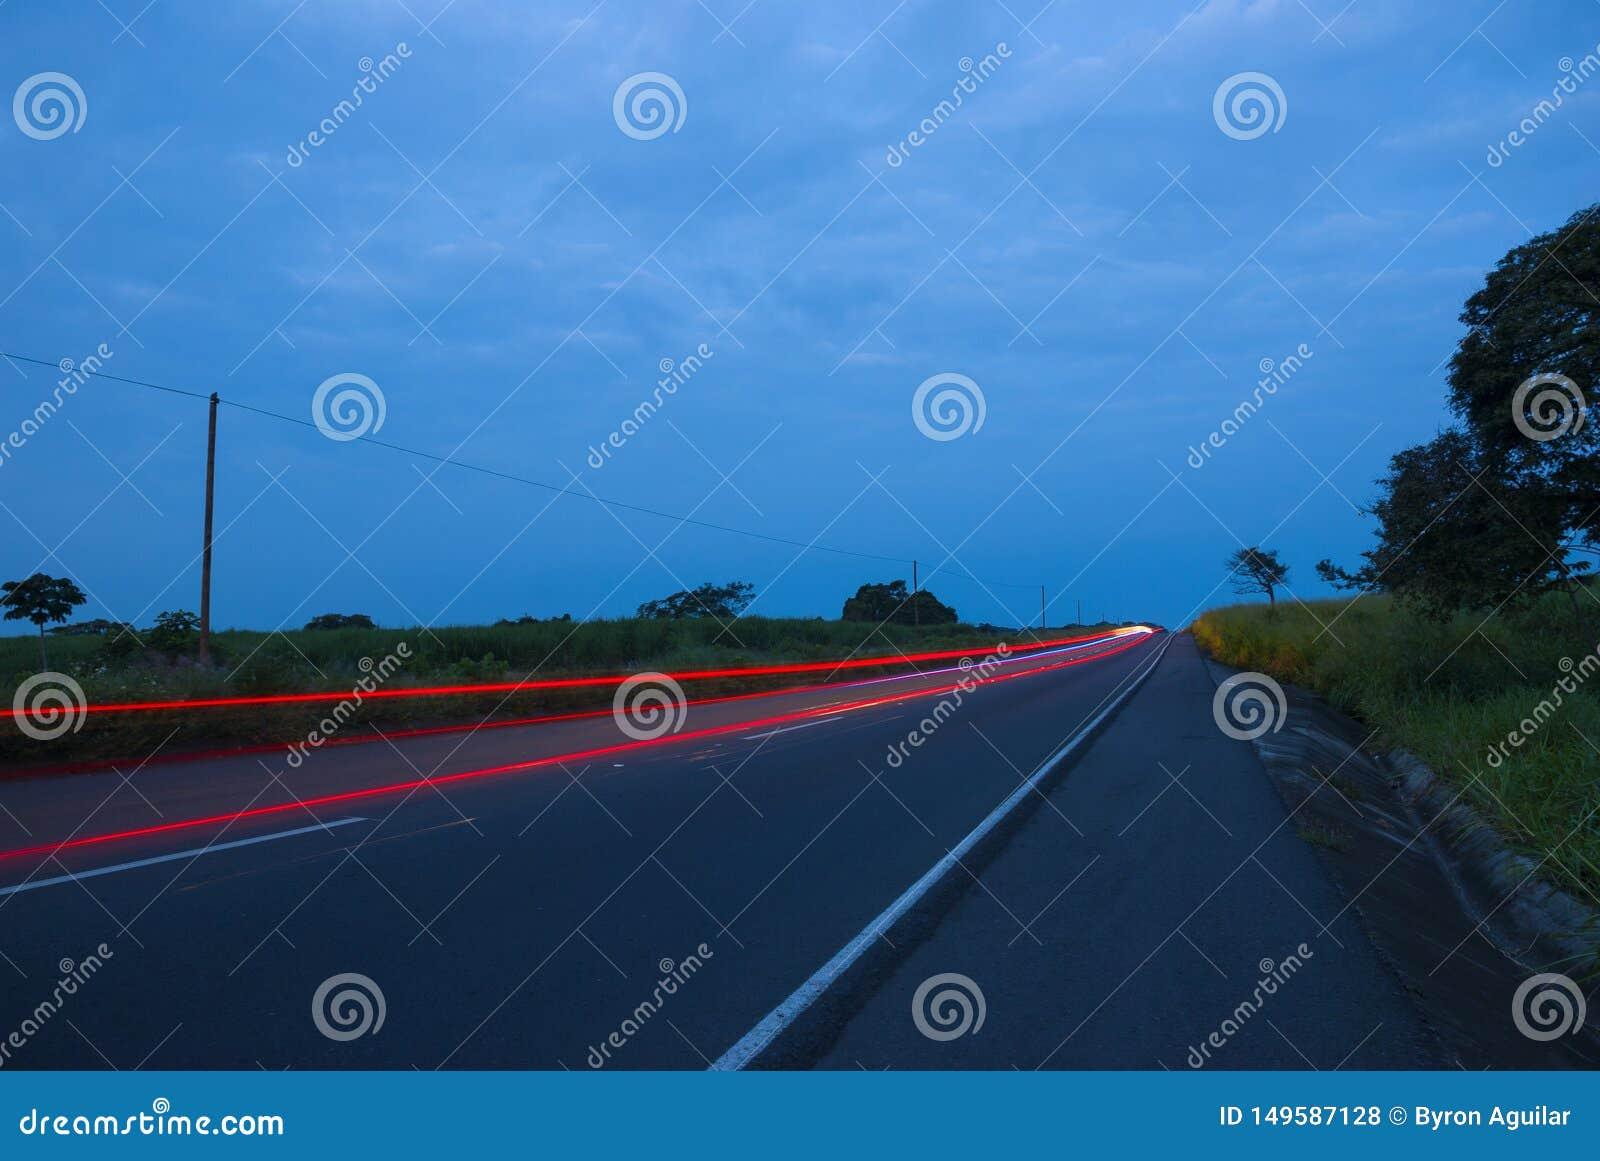 Bilspeedingon en huvudv?g, Guatemala, Central America, hastighetsbil